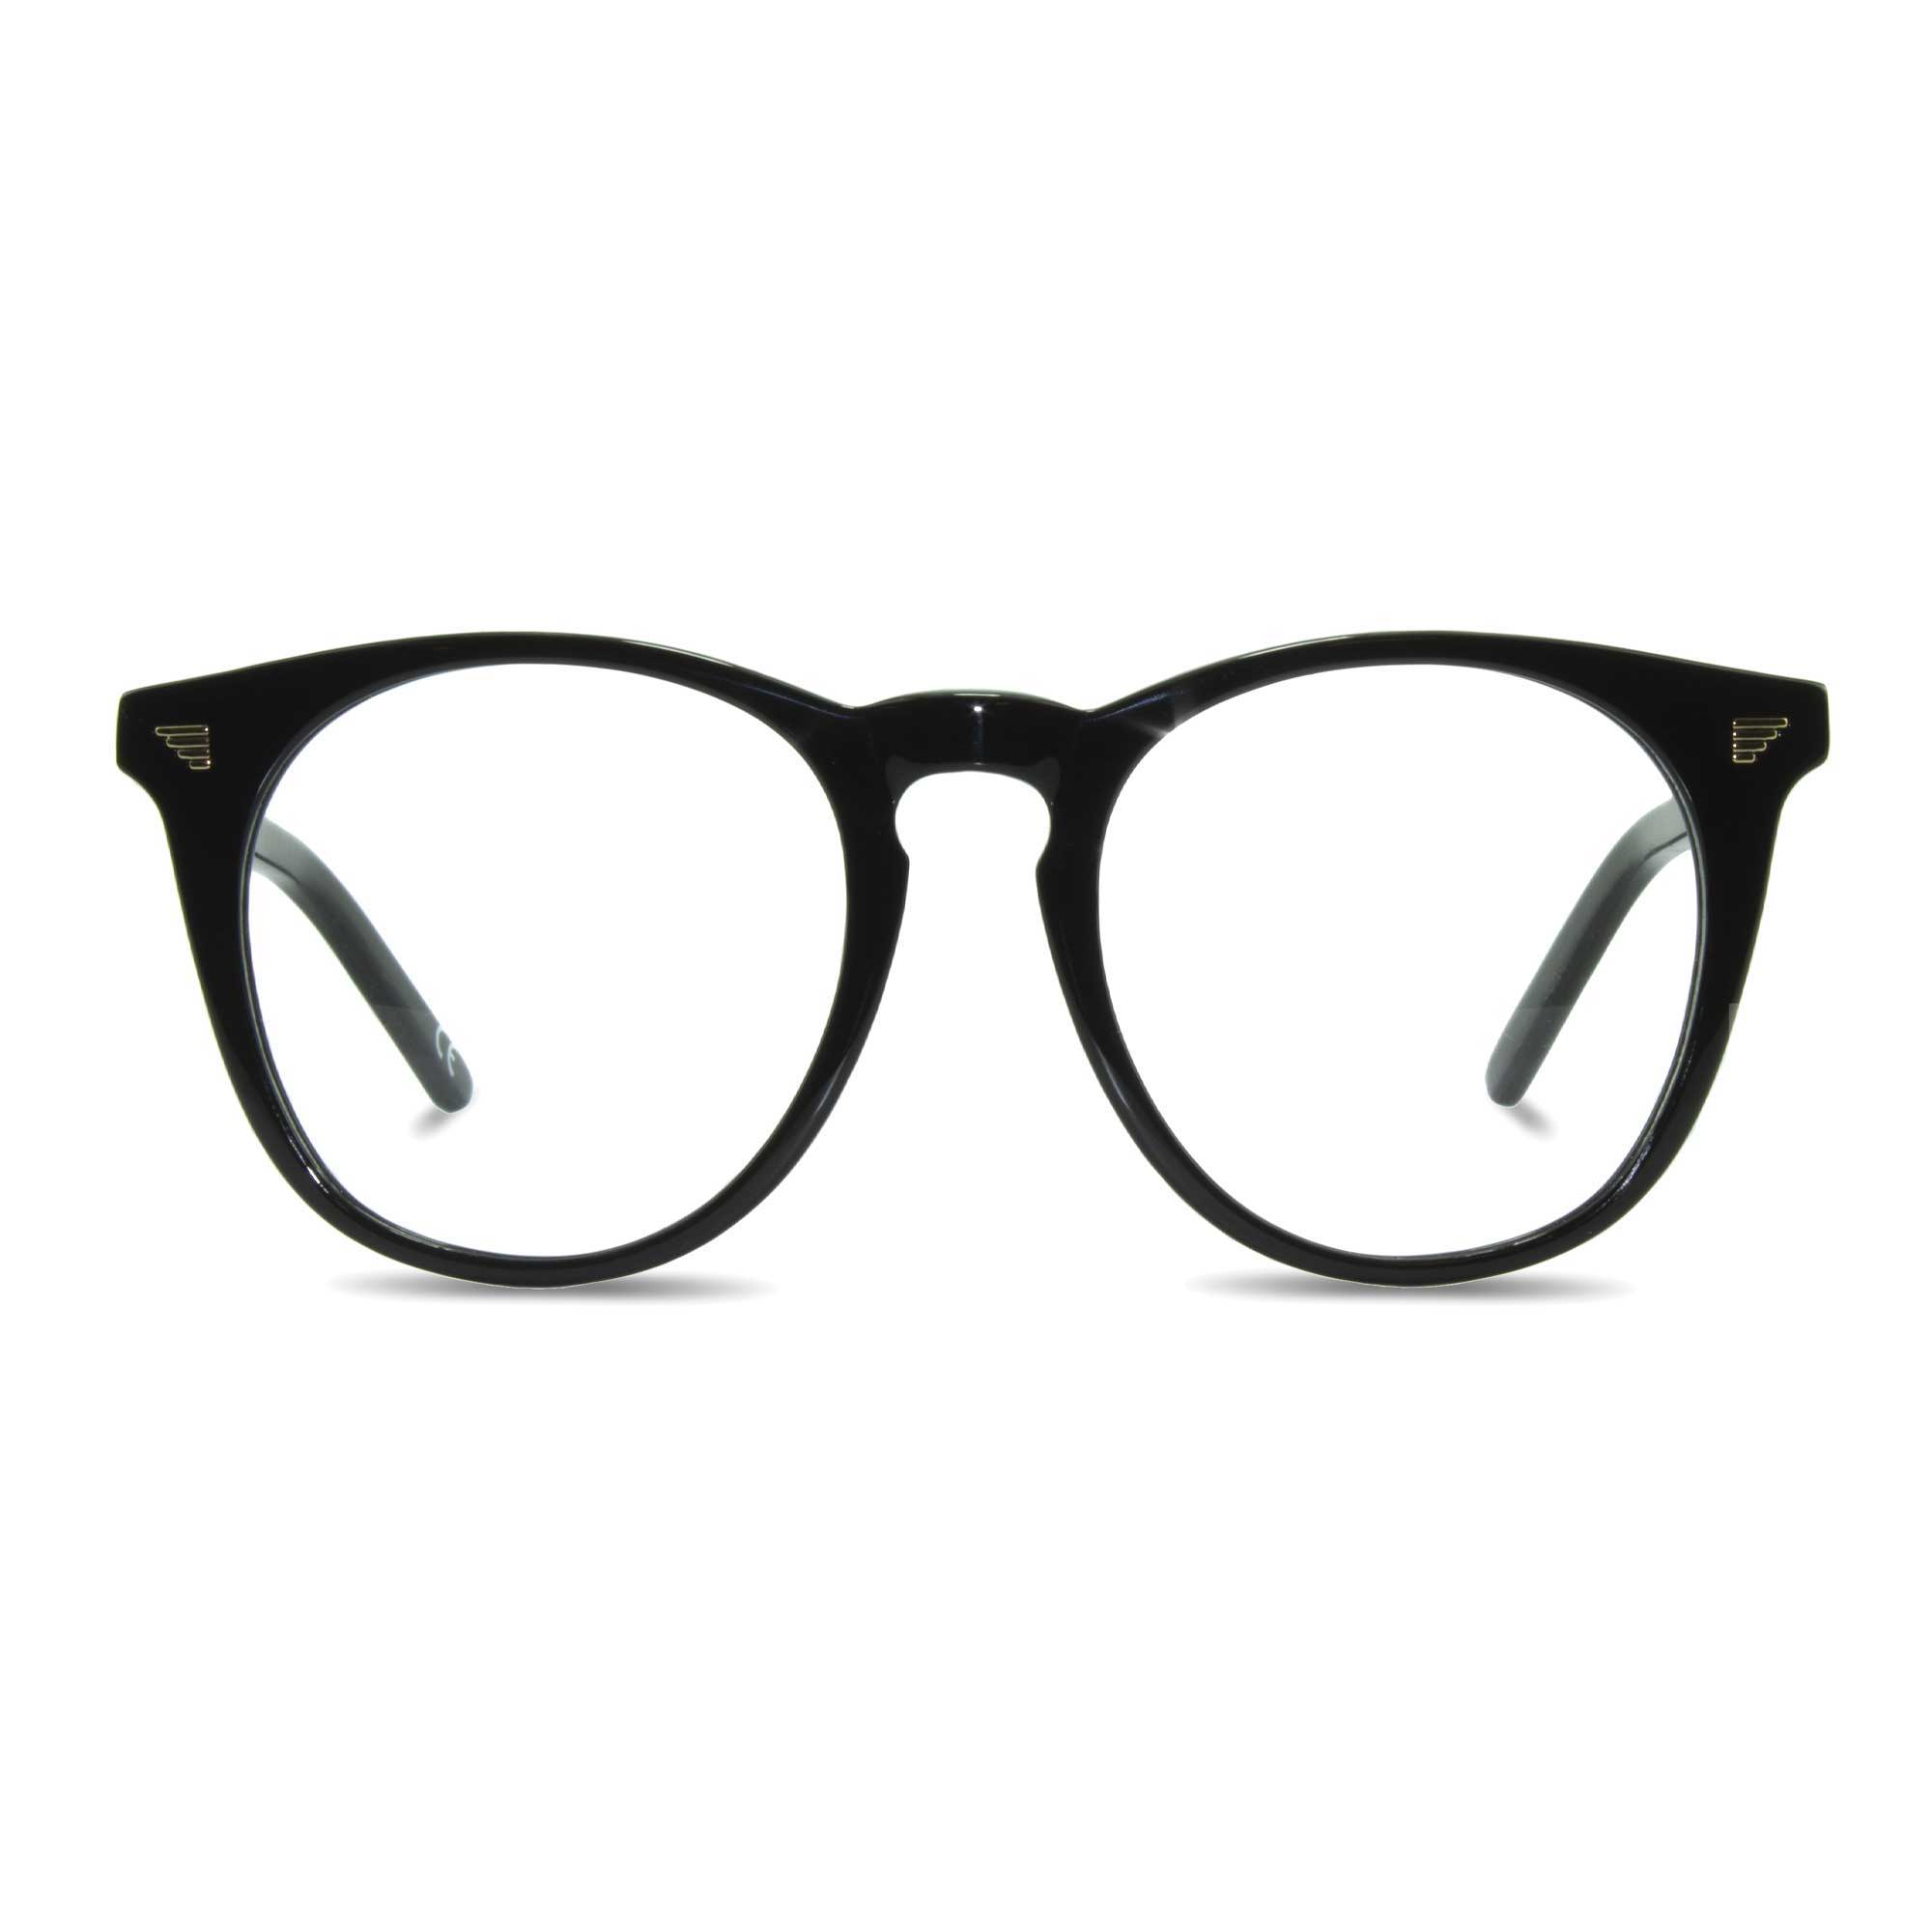 Joiuss deano black round glasses